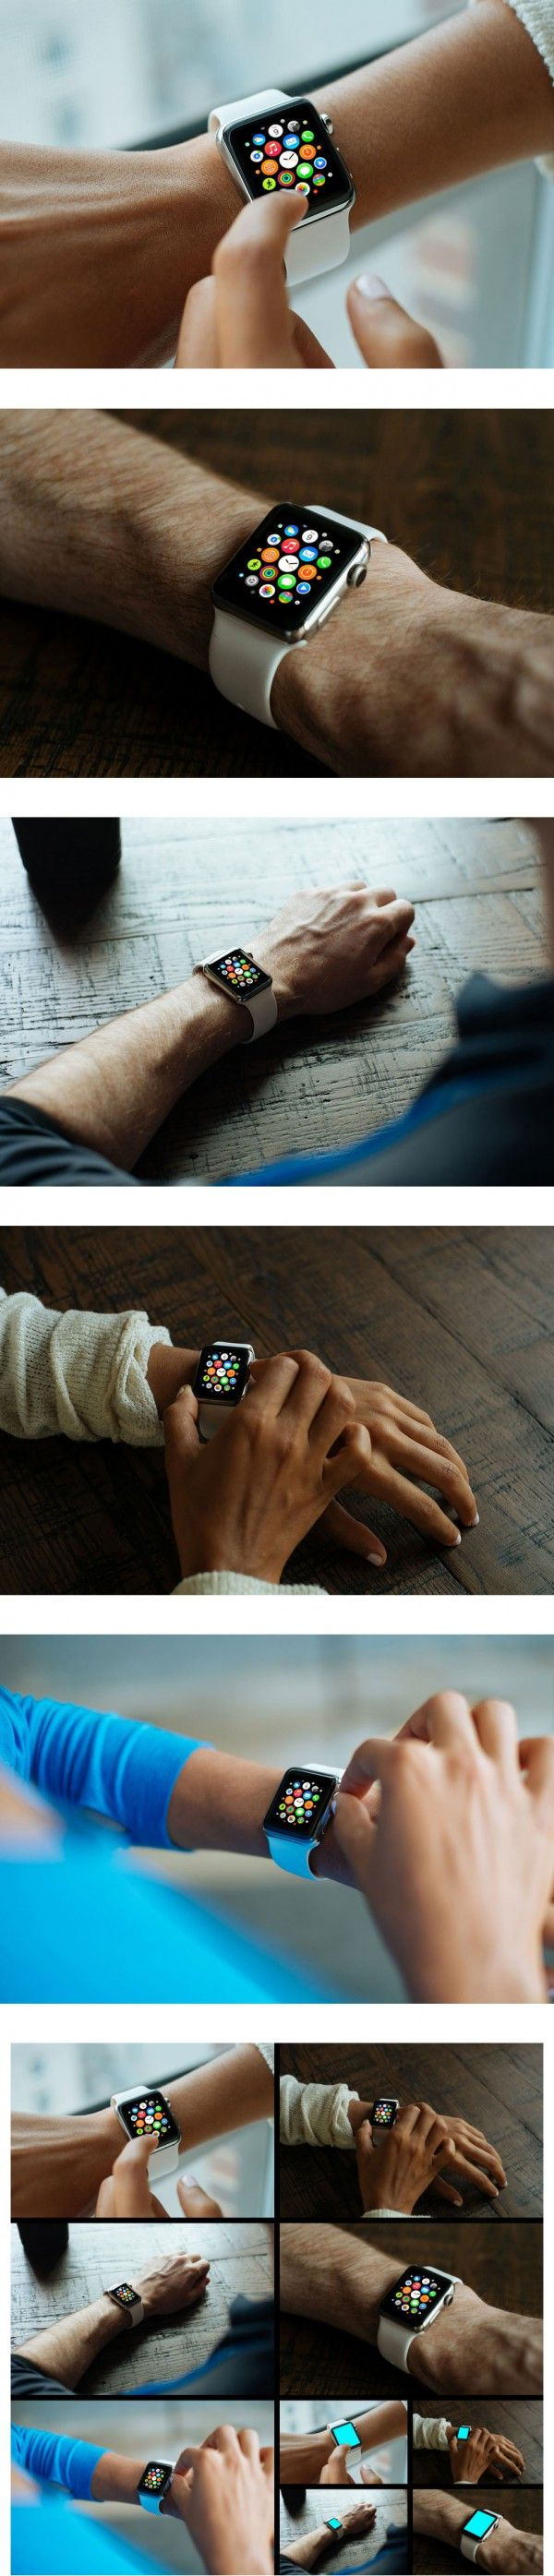 5 Apple Watch Mockups Psd